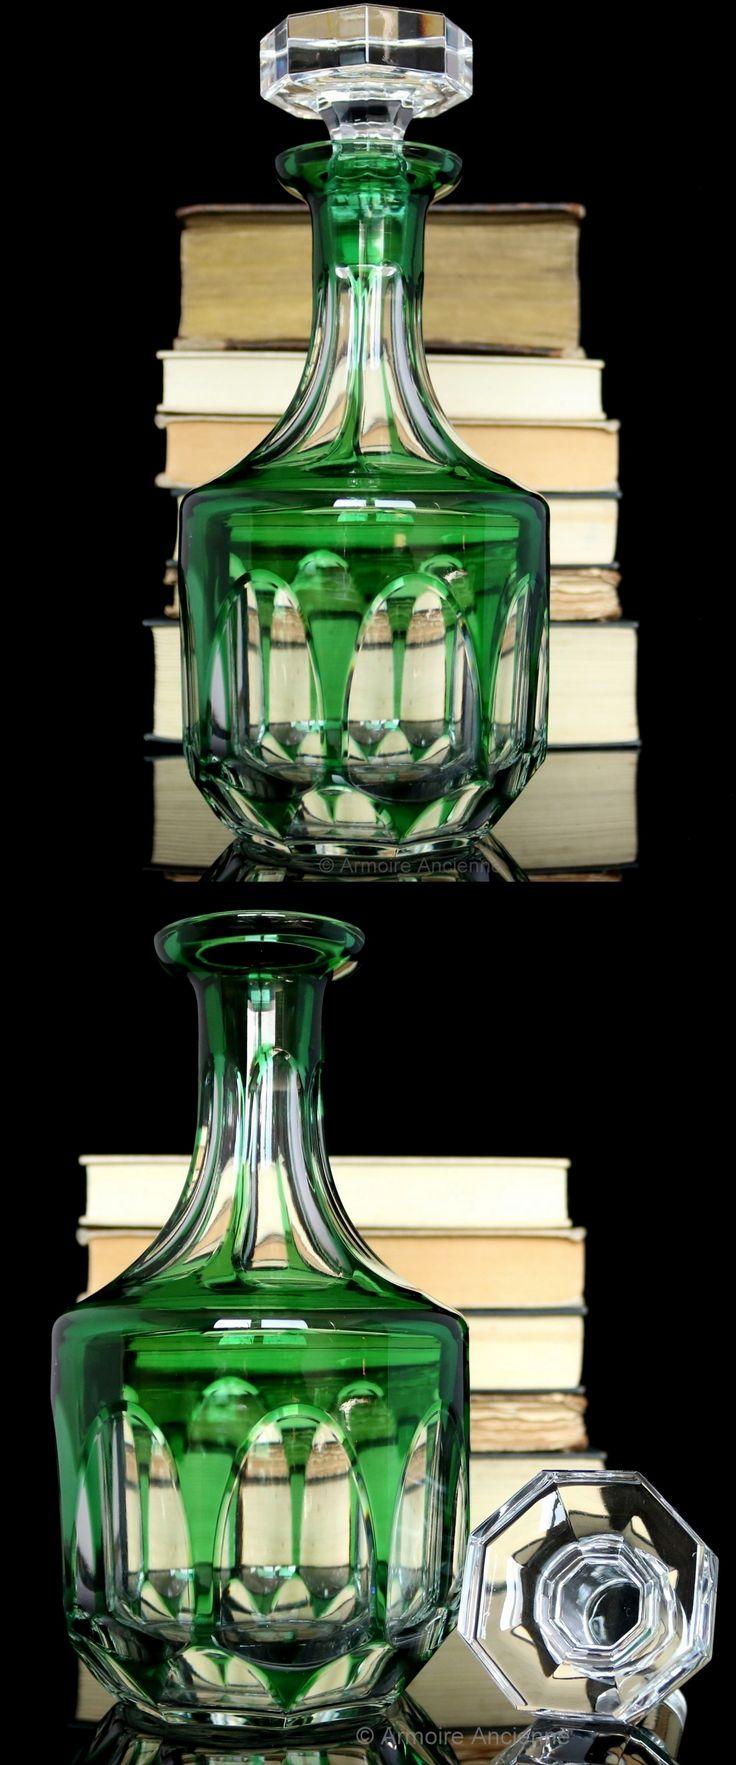 BUY on ETSY: Emerald Green Art Deco Cut Crystal Decanter for Whiskey, Cognac, Wine / Mid Century German Barware & Bar Cart Accessories